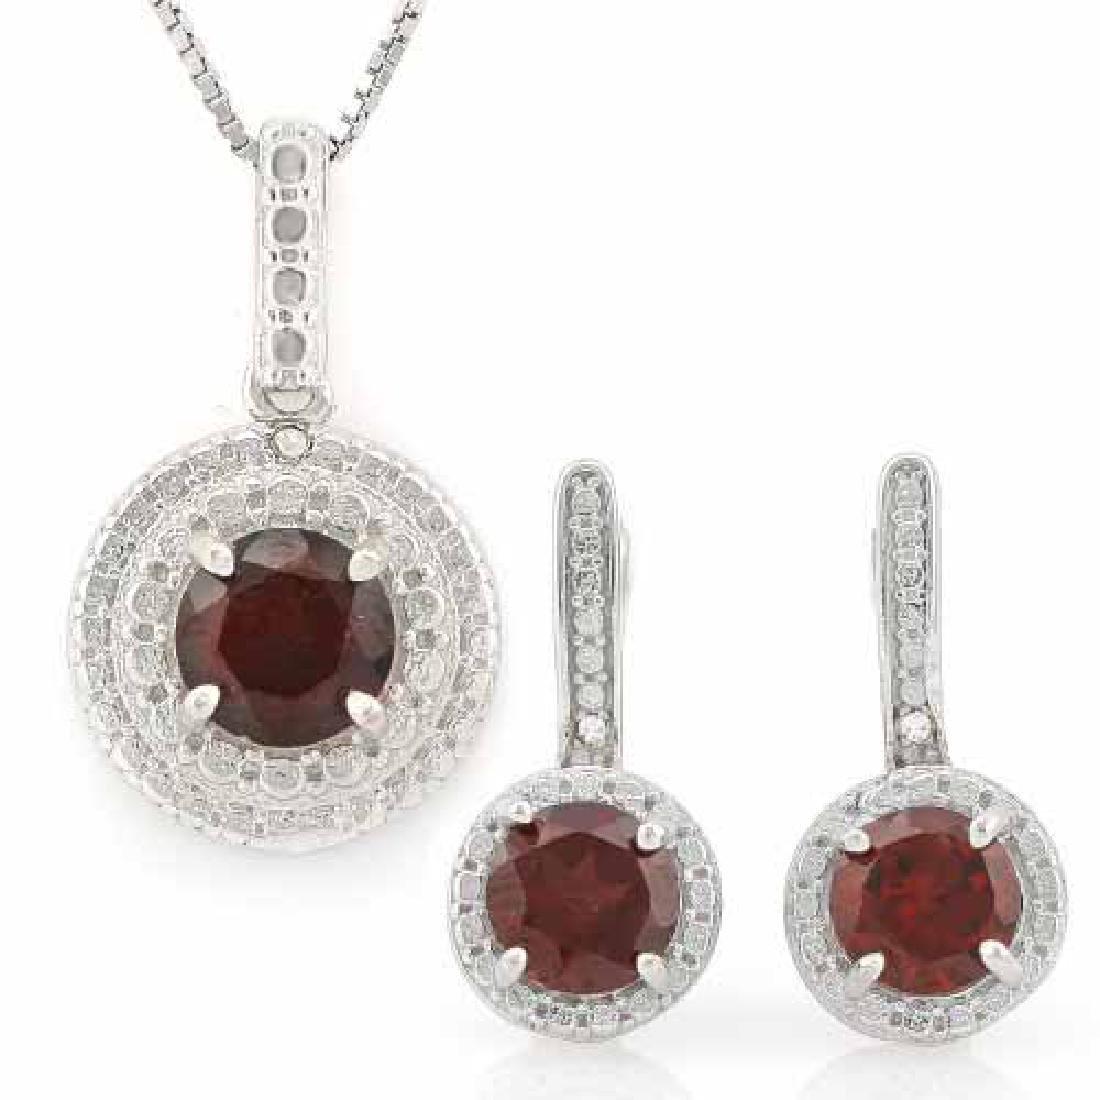 3 CARAT GARNETS & GENUINE DIAMONDS 925 STERLING SILVER